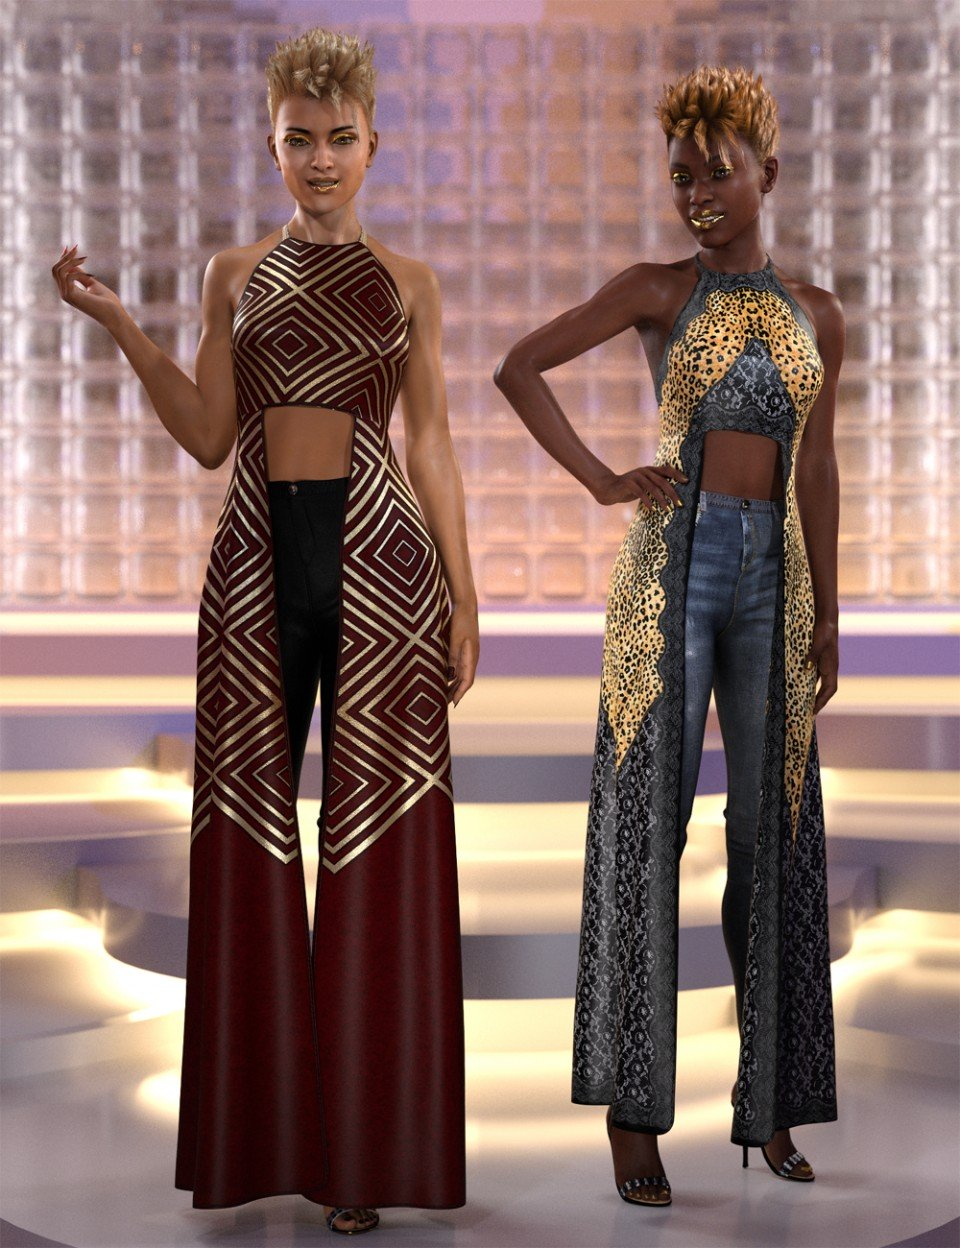 dForce Step it Up Outfit Textures_DAZ3D下载站